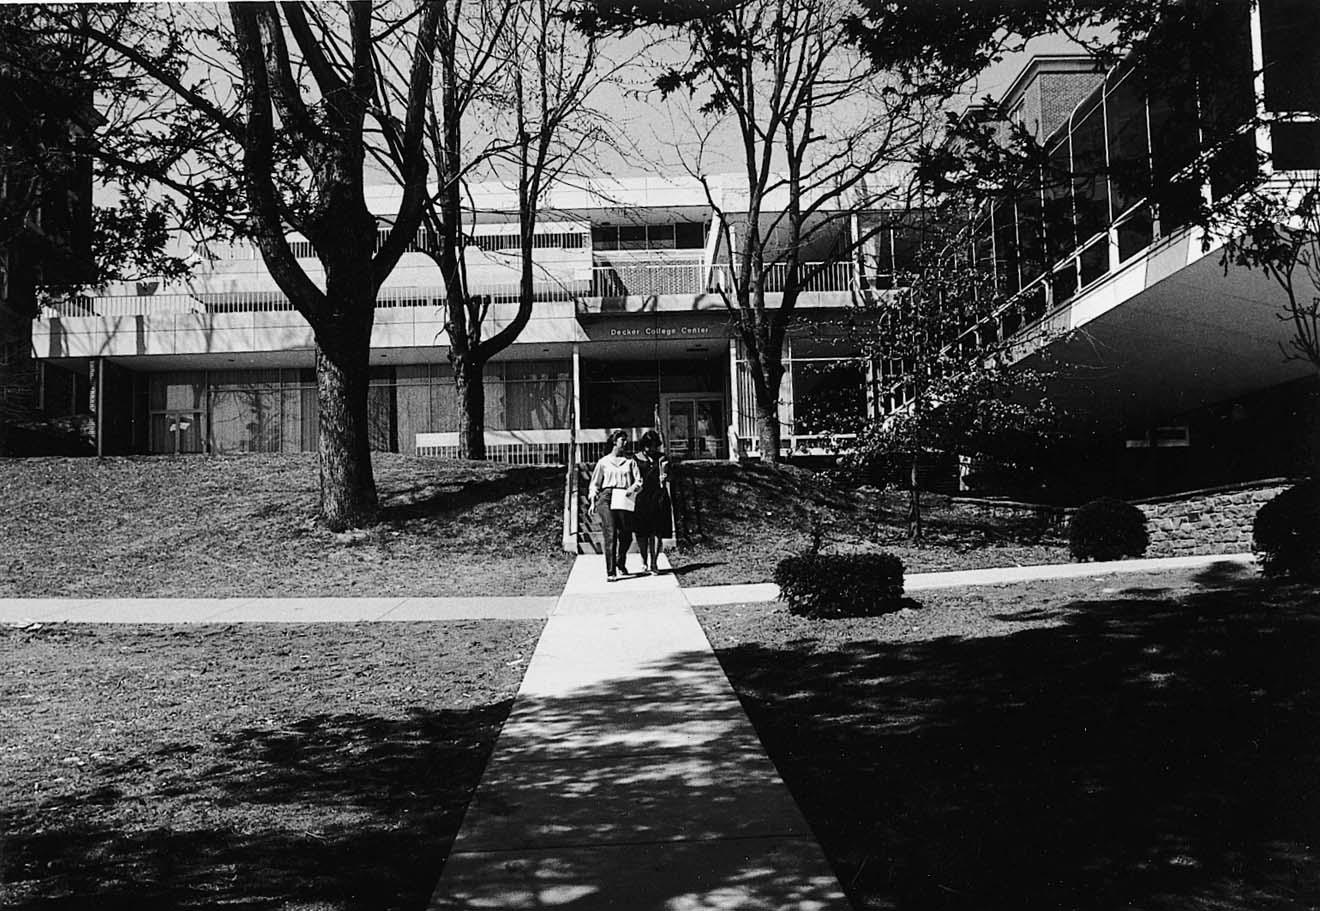 South side of Decker College Center circa 1980